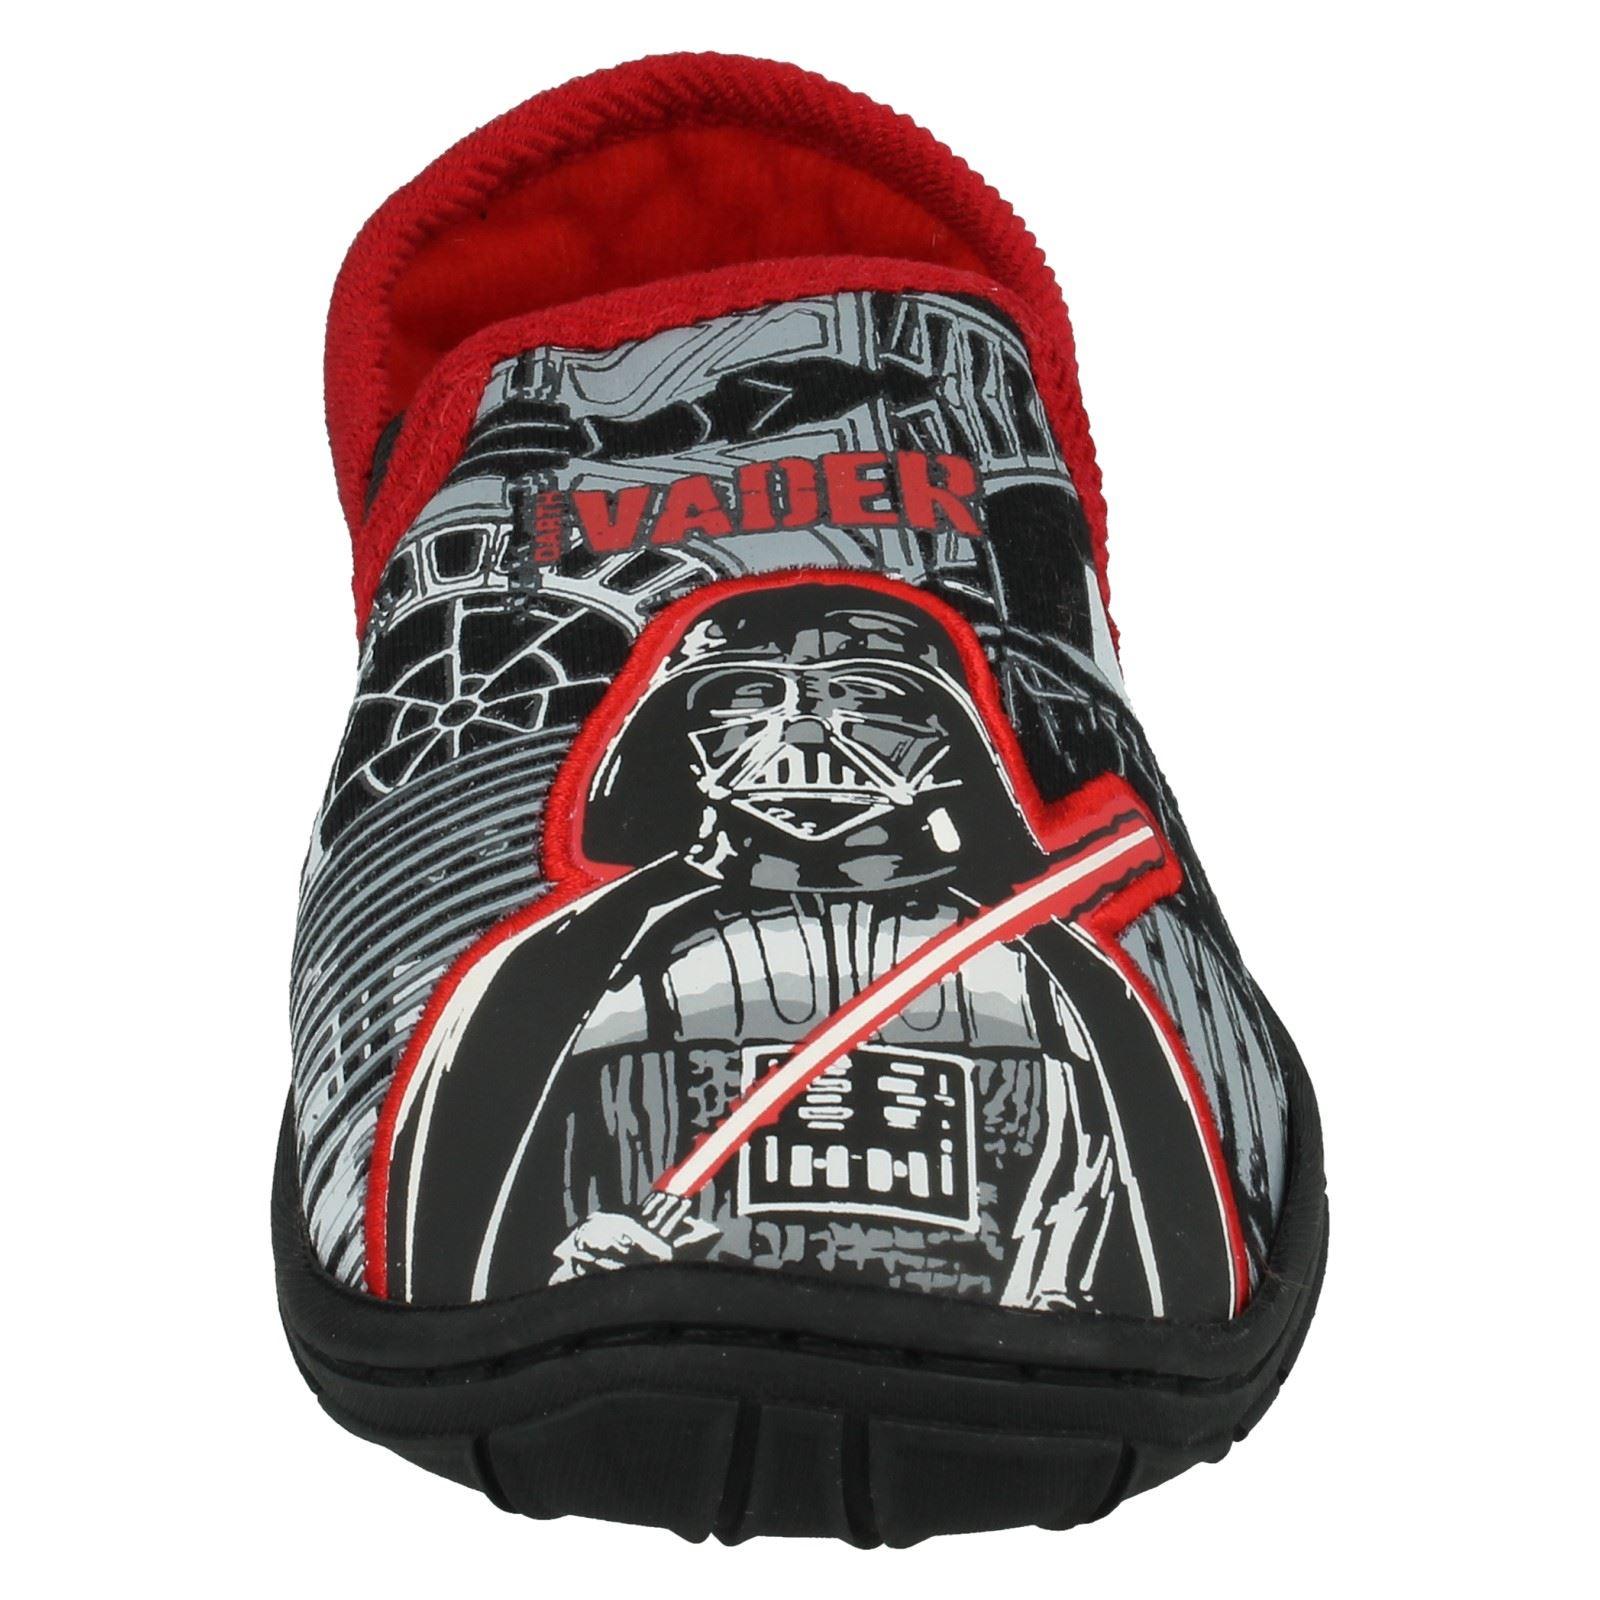 Chicos Disney Star Wars Pantuflas Etiqueta GSS02 327